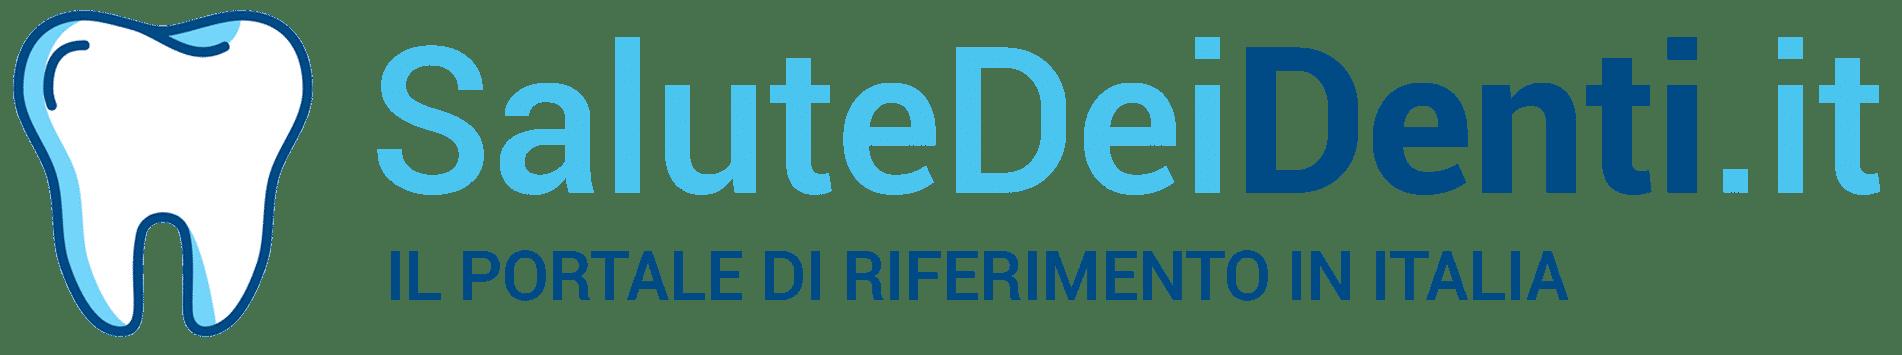 salutedeidenti.it logo